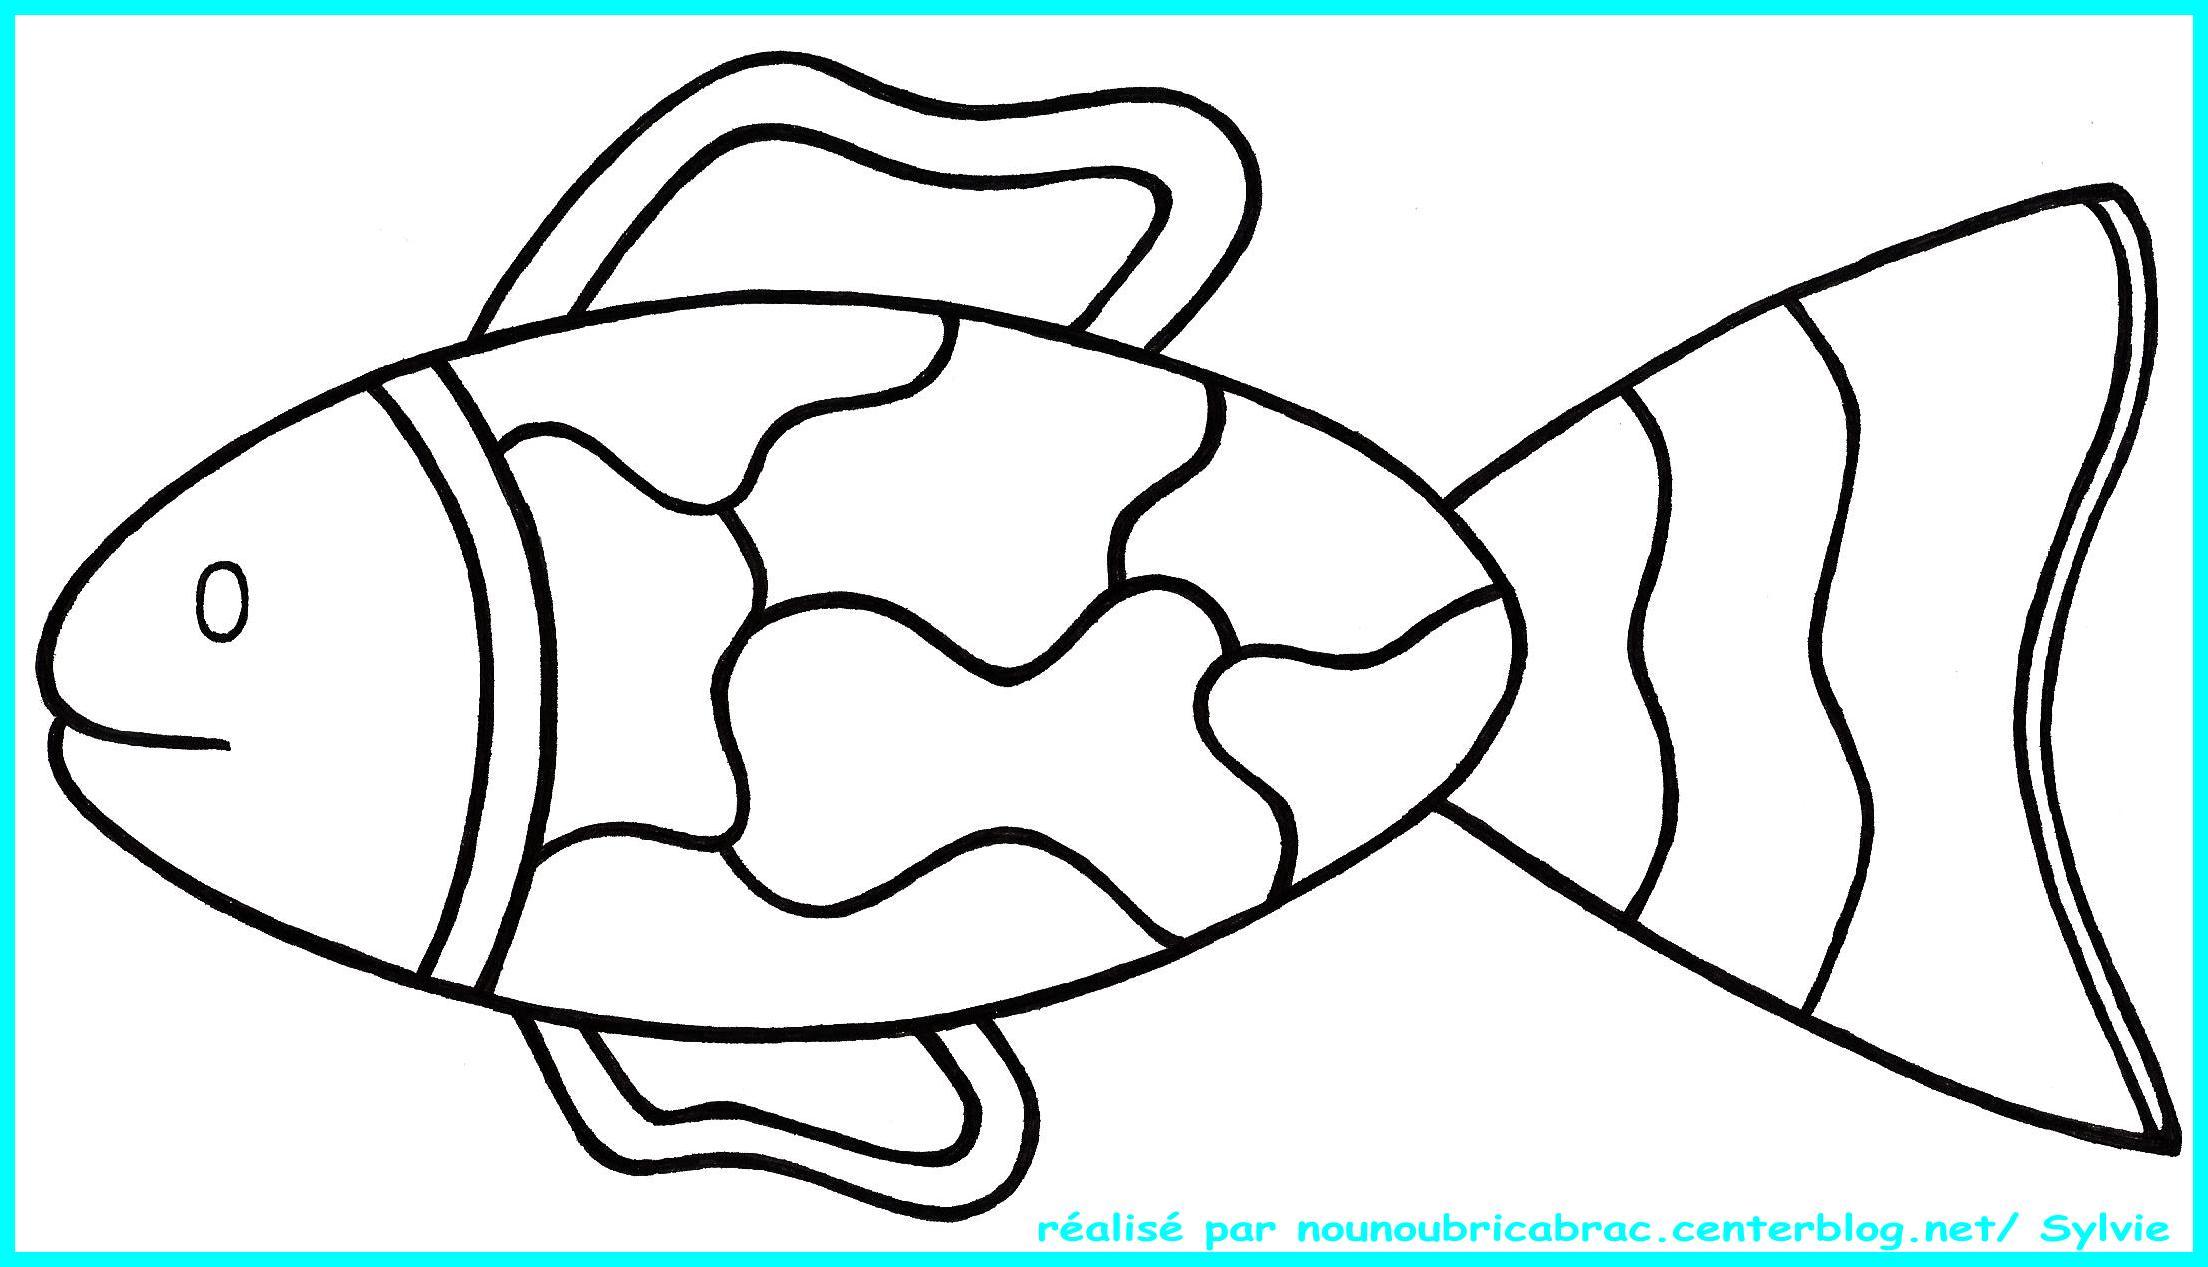 dessin interactif poisson